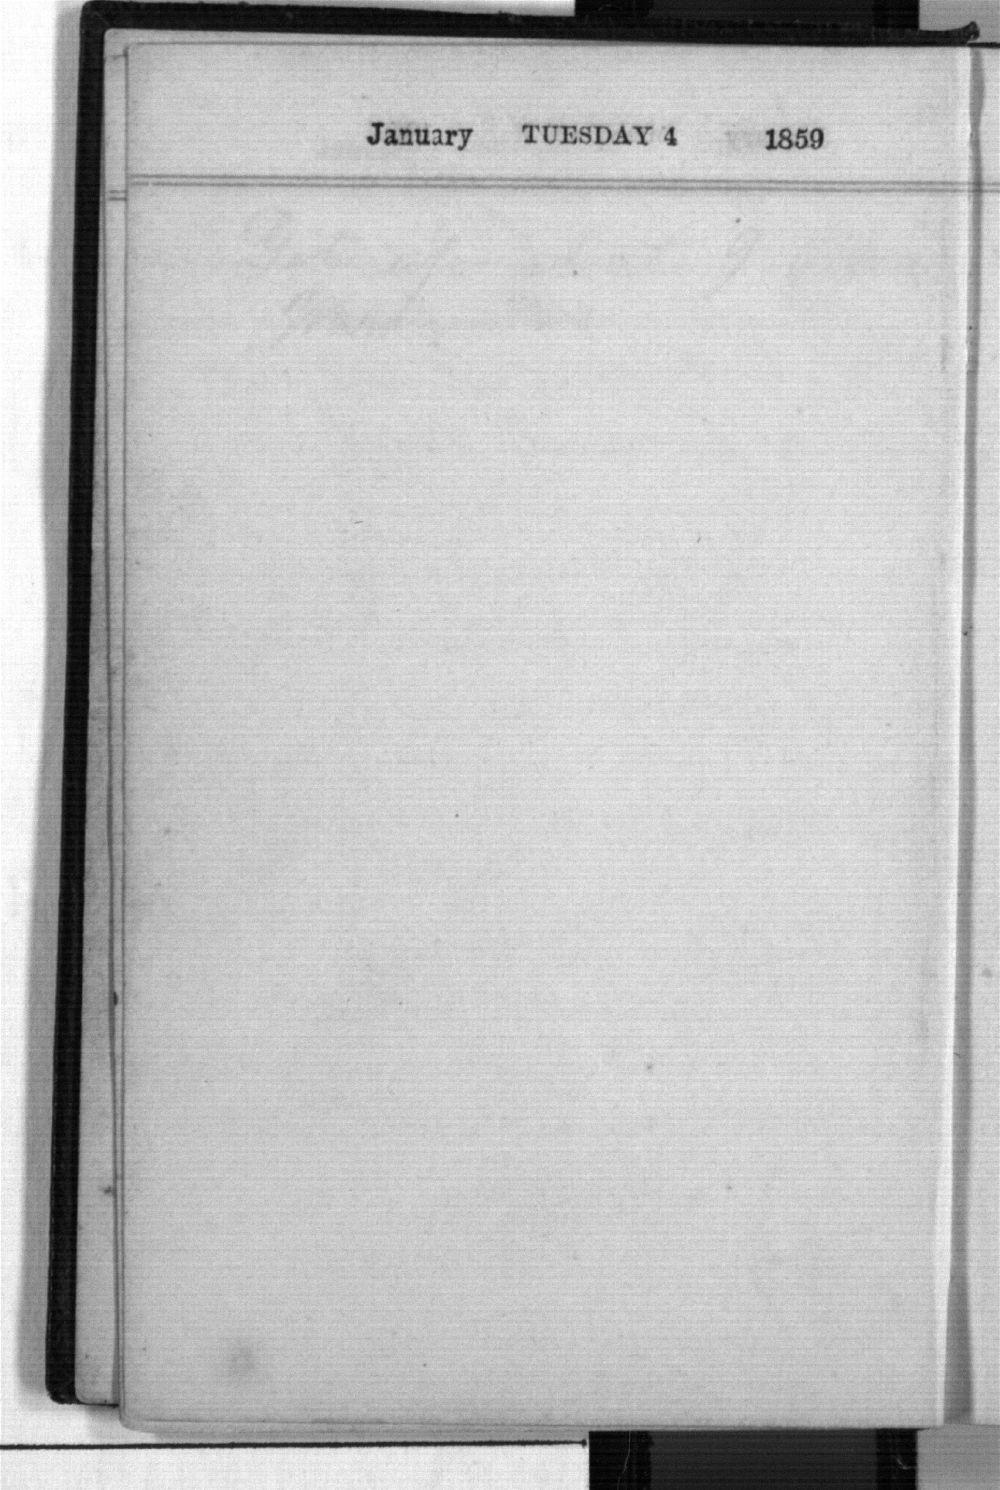 Daniel Mulford Valentine's diary - Jan 4